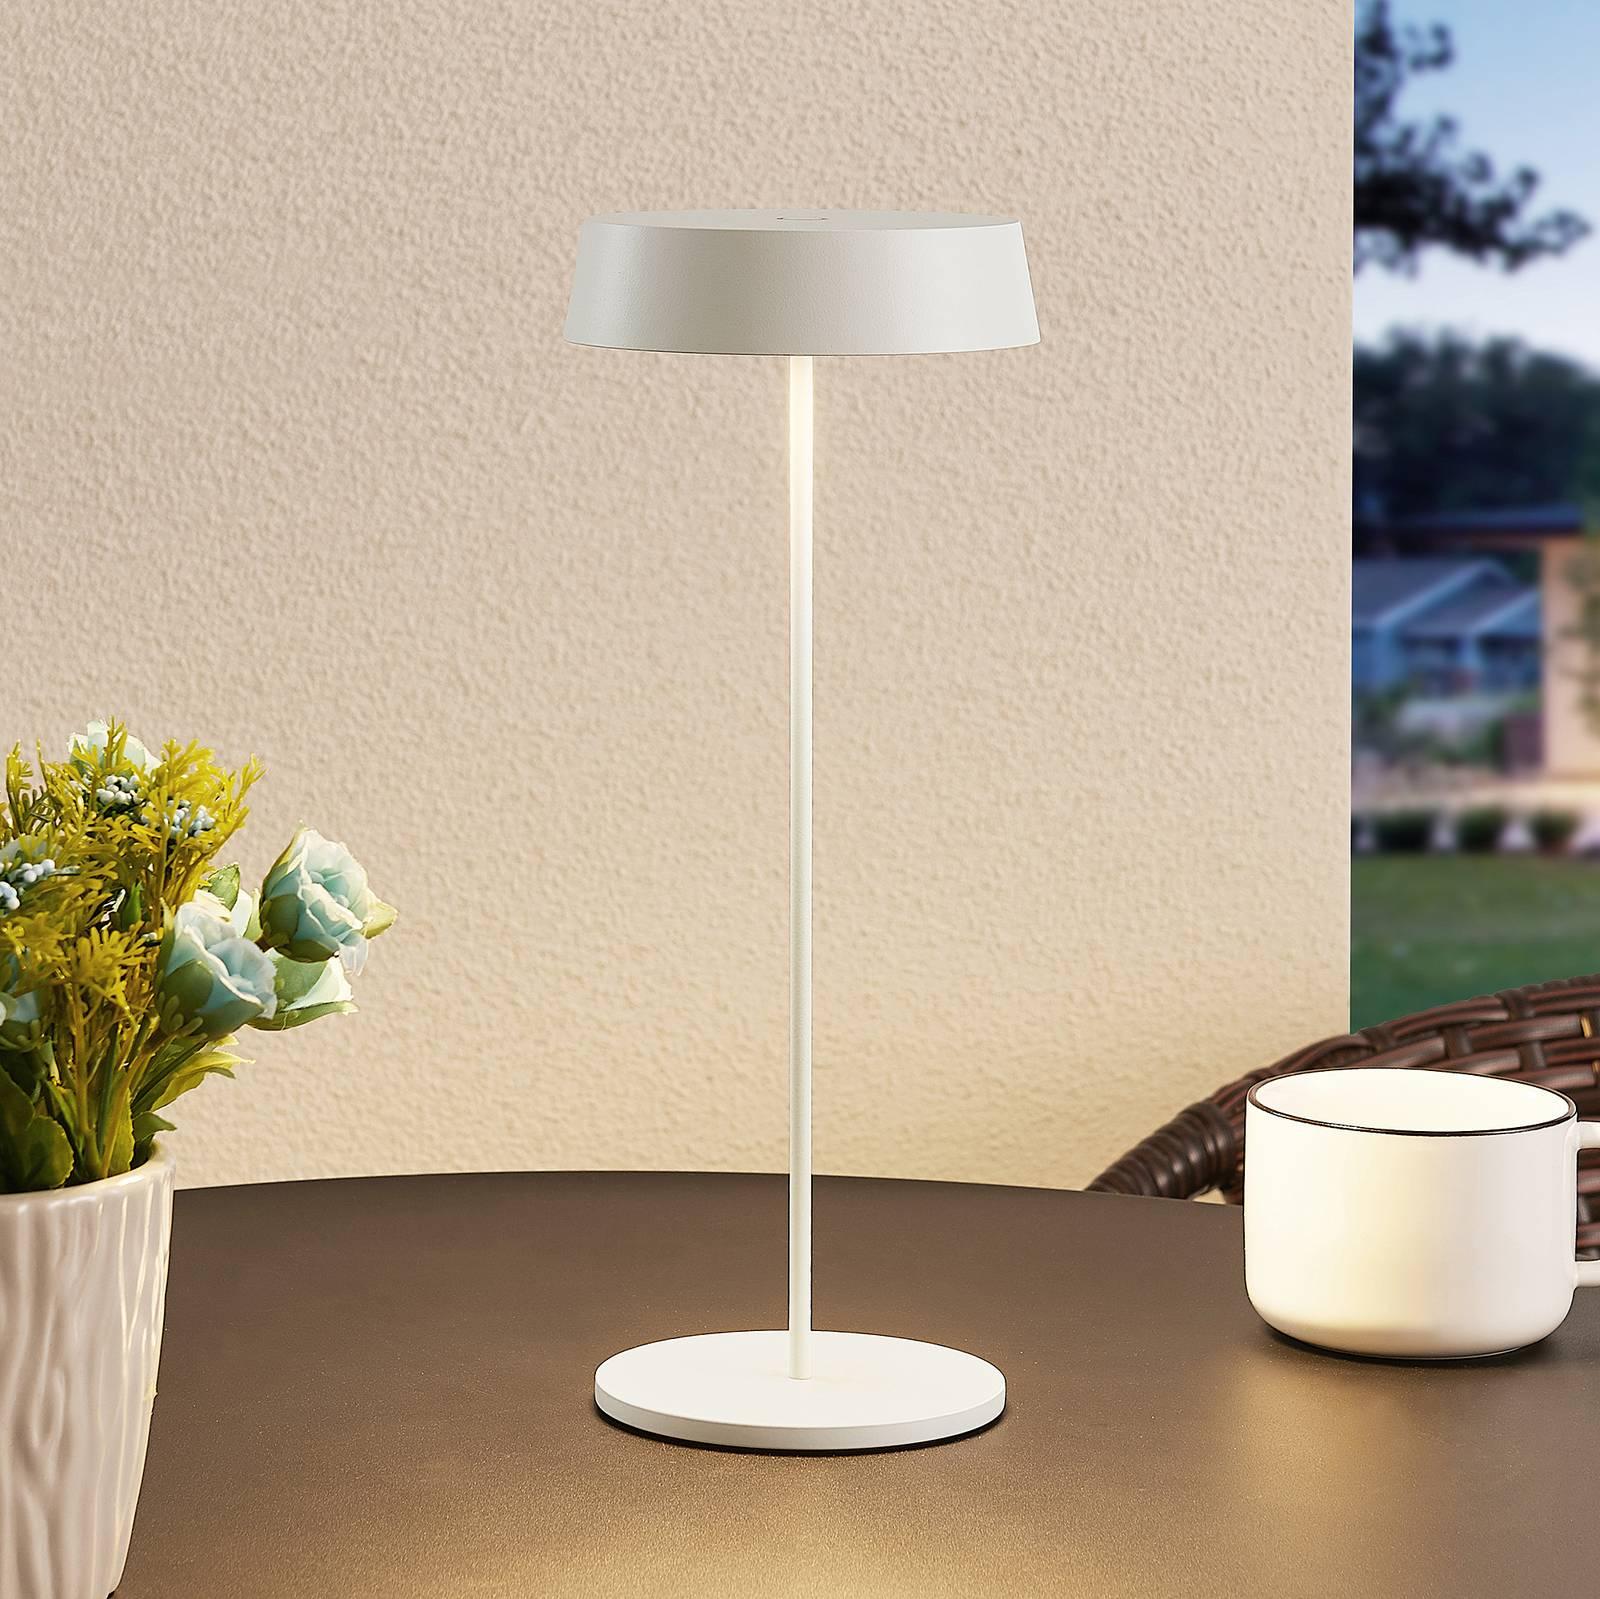 Lucande Tibia lampe à poser LED, USB, blanche